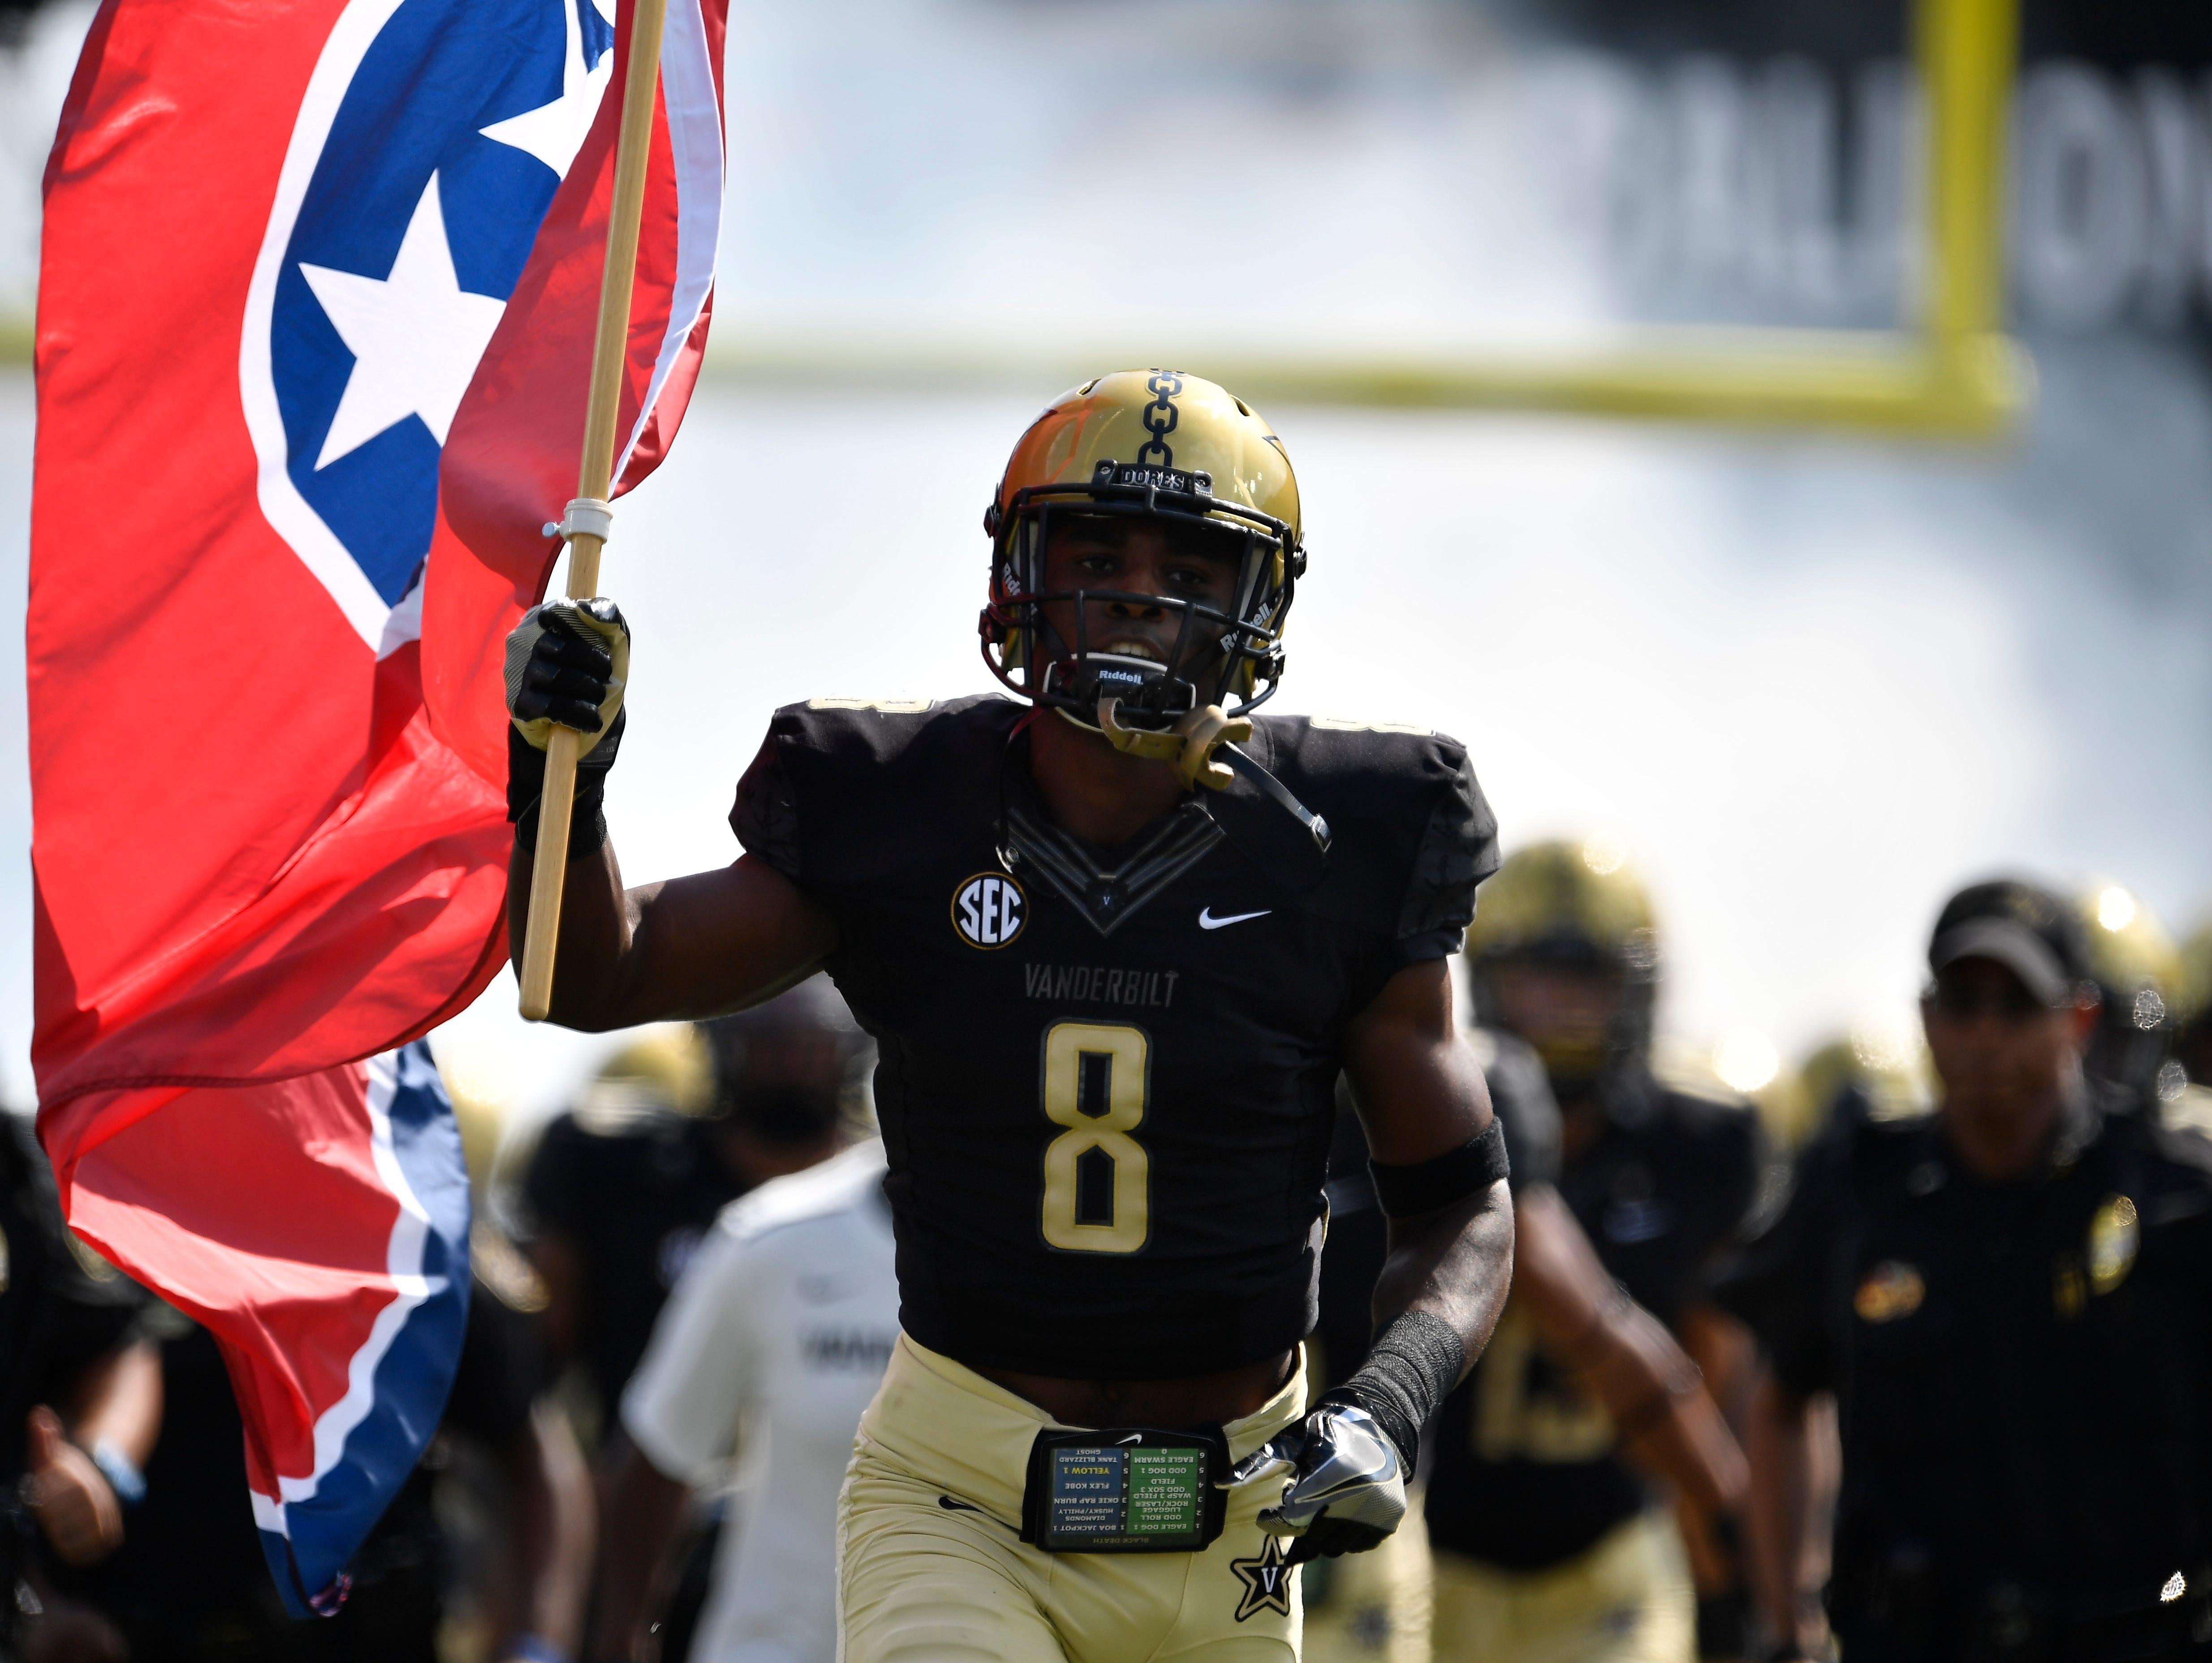 Vanderbilt football schedule: 2018 opponents, TV stations